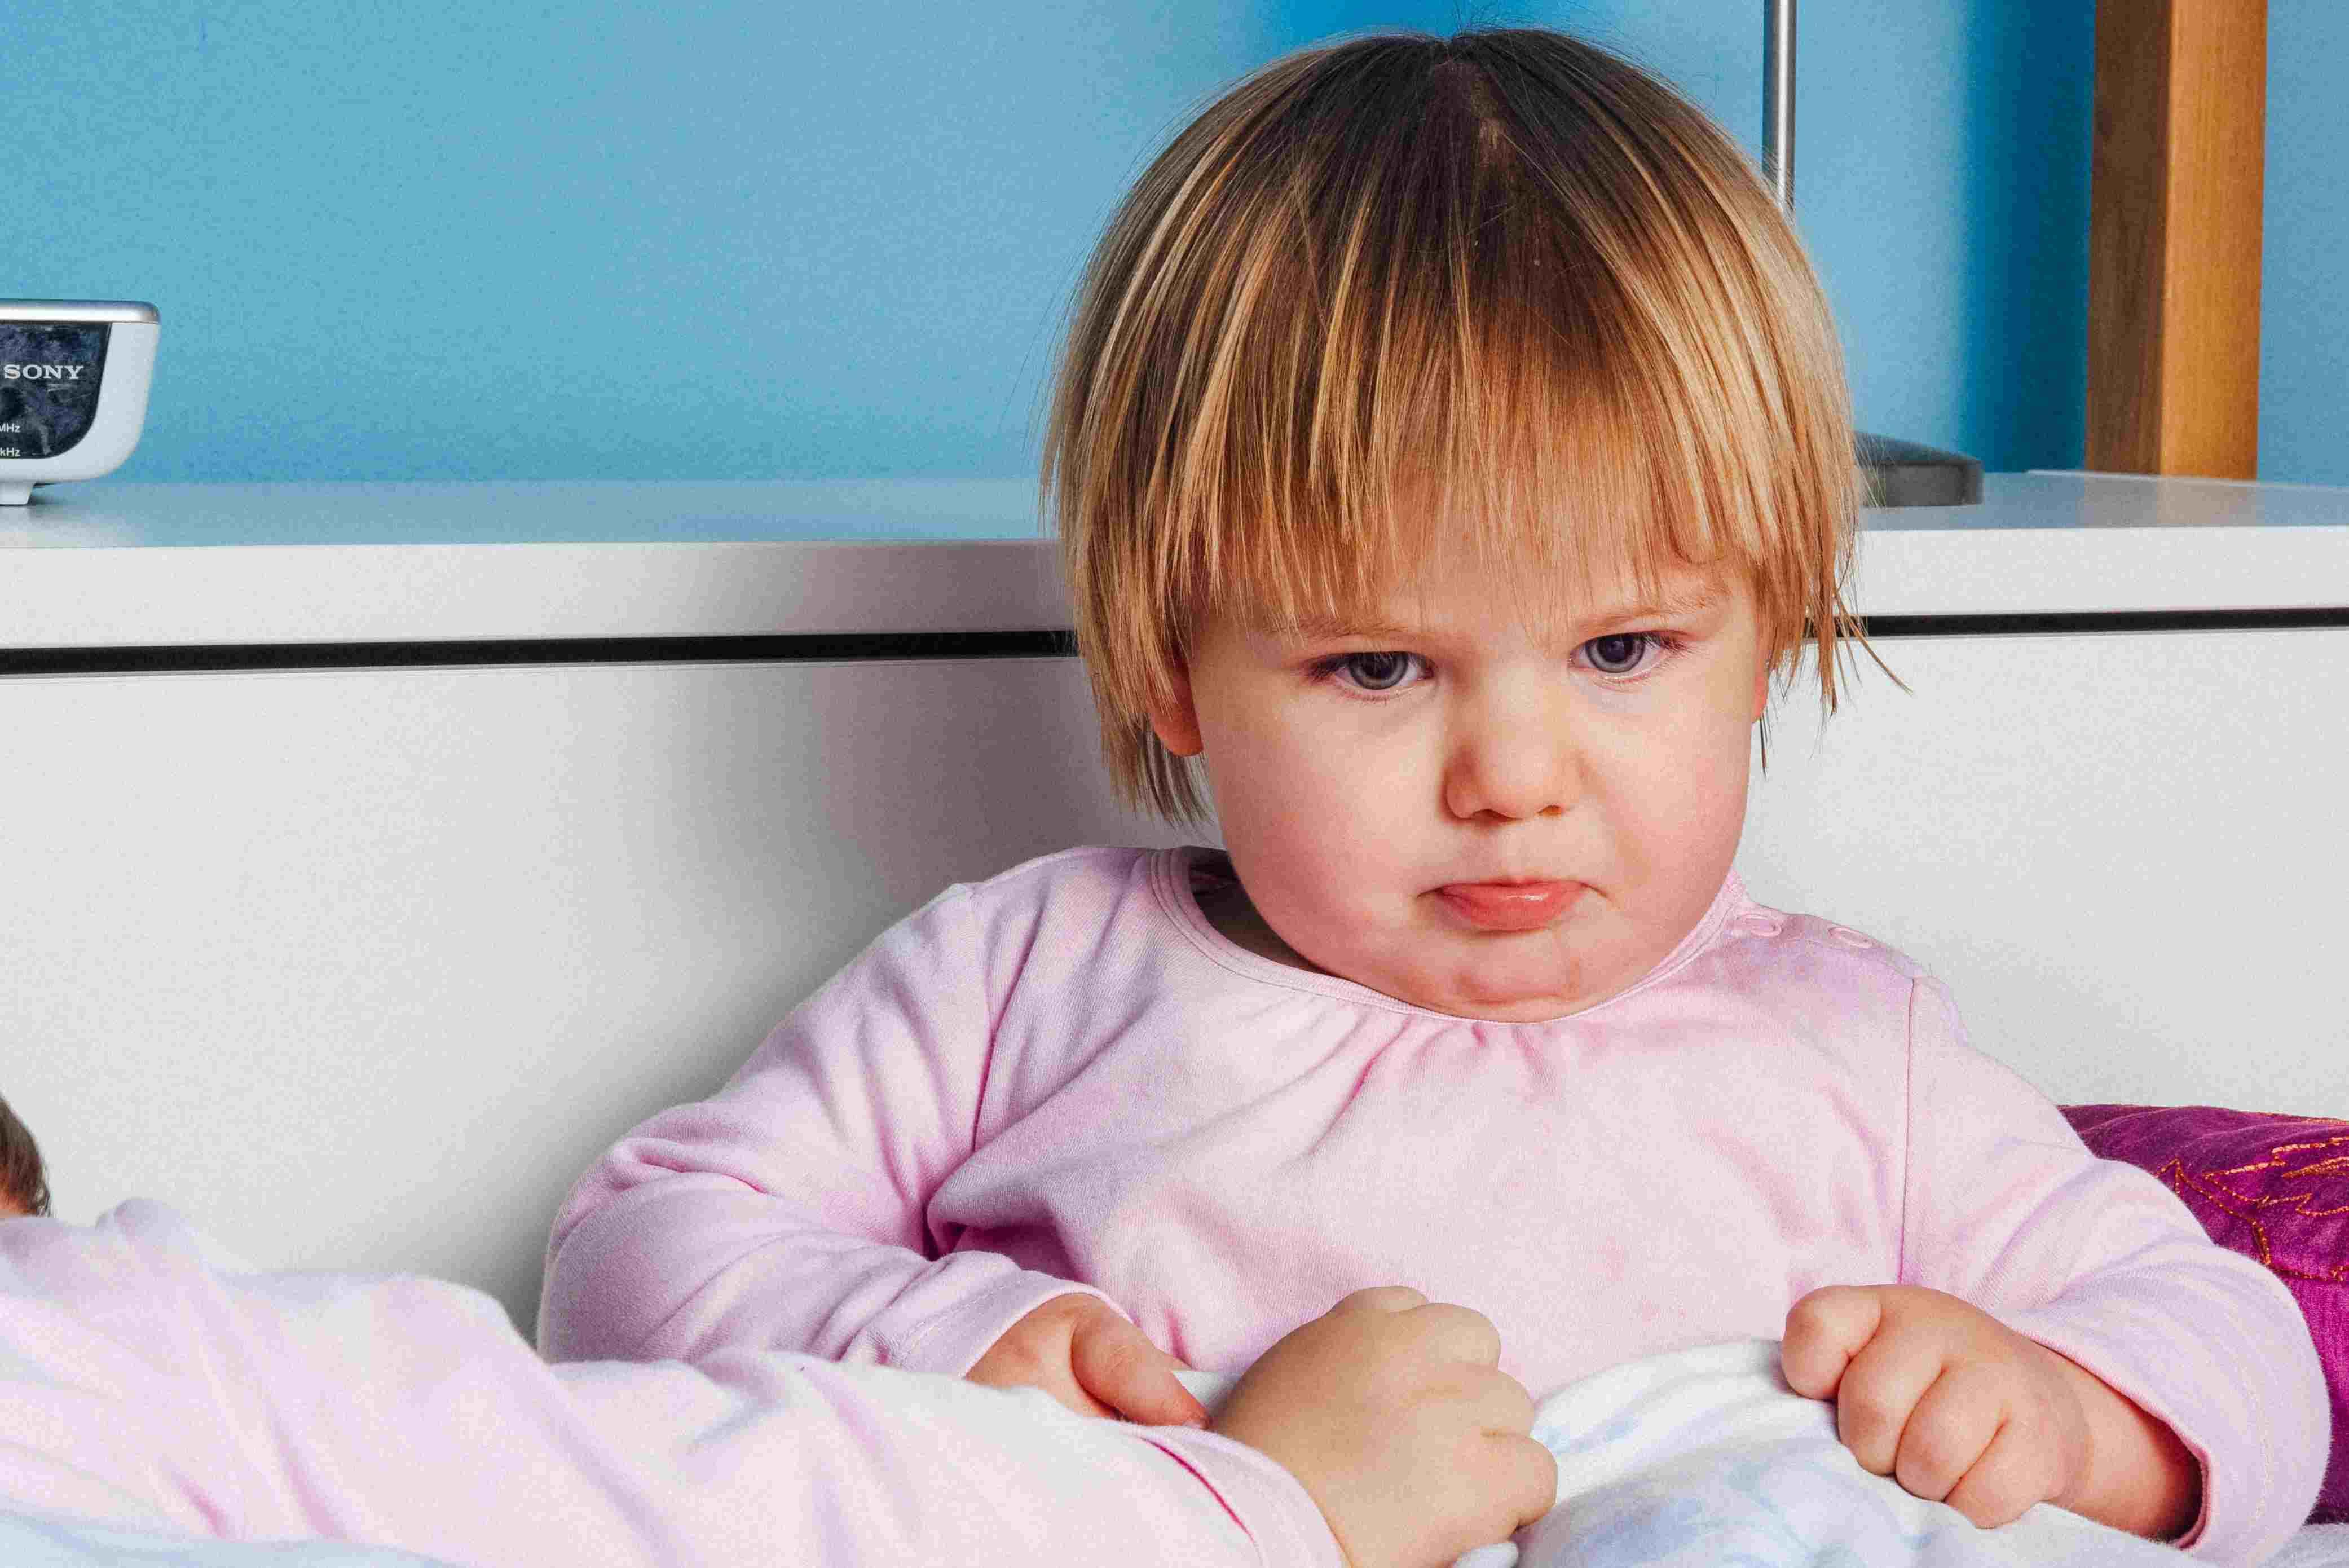 encopresis effected child